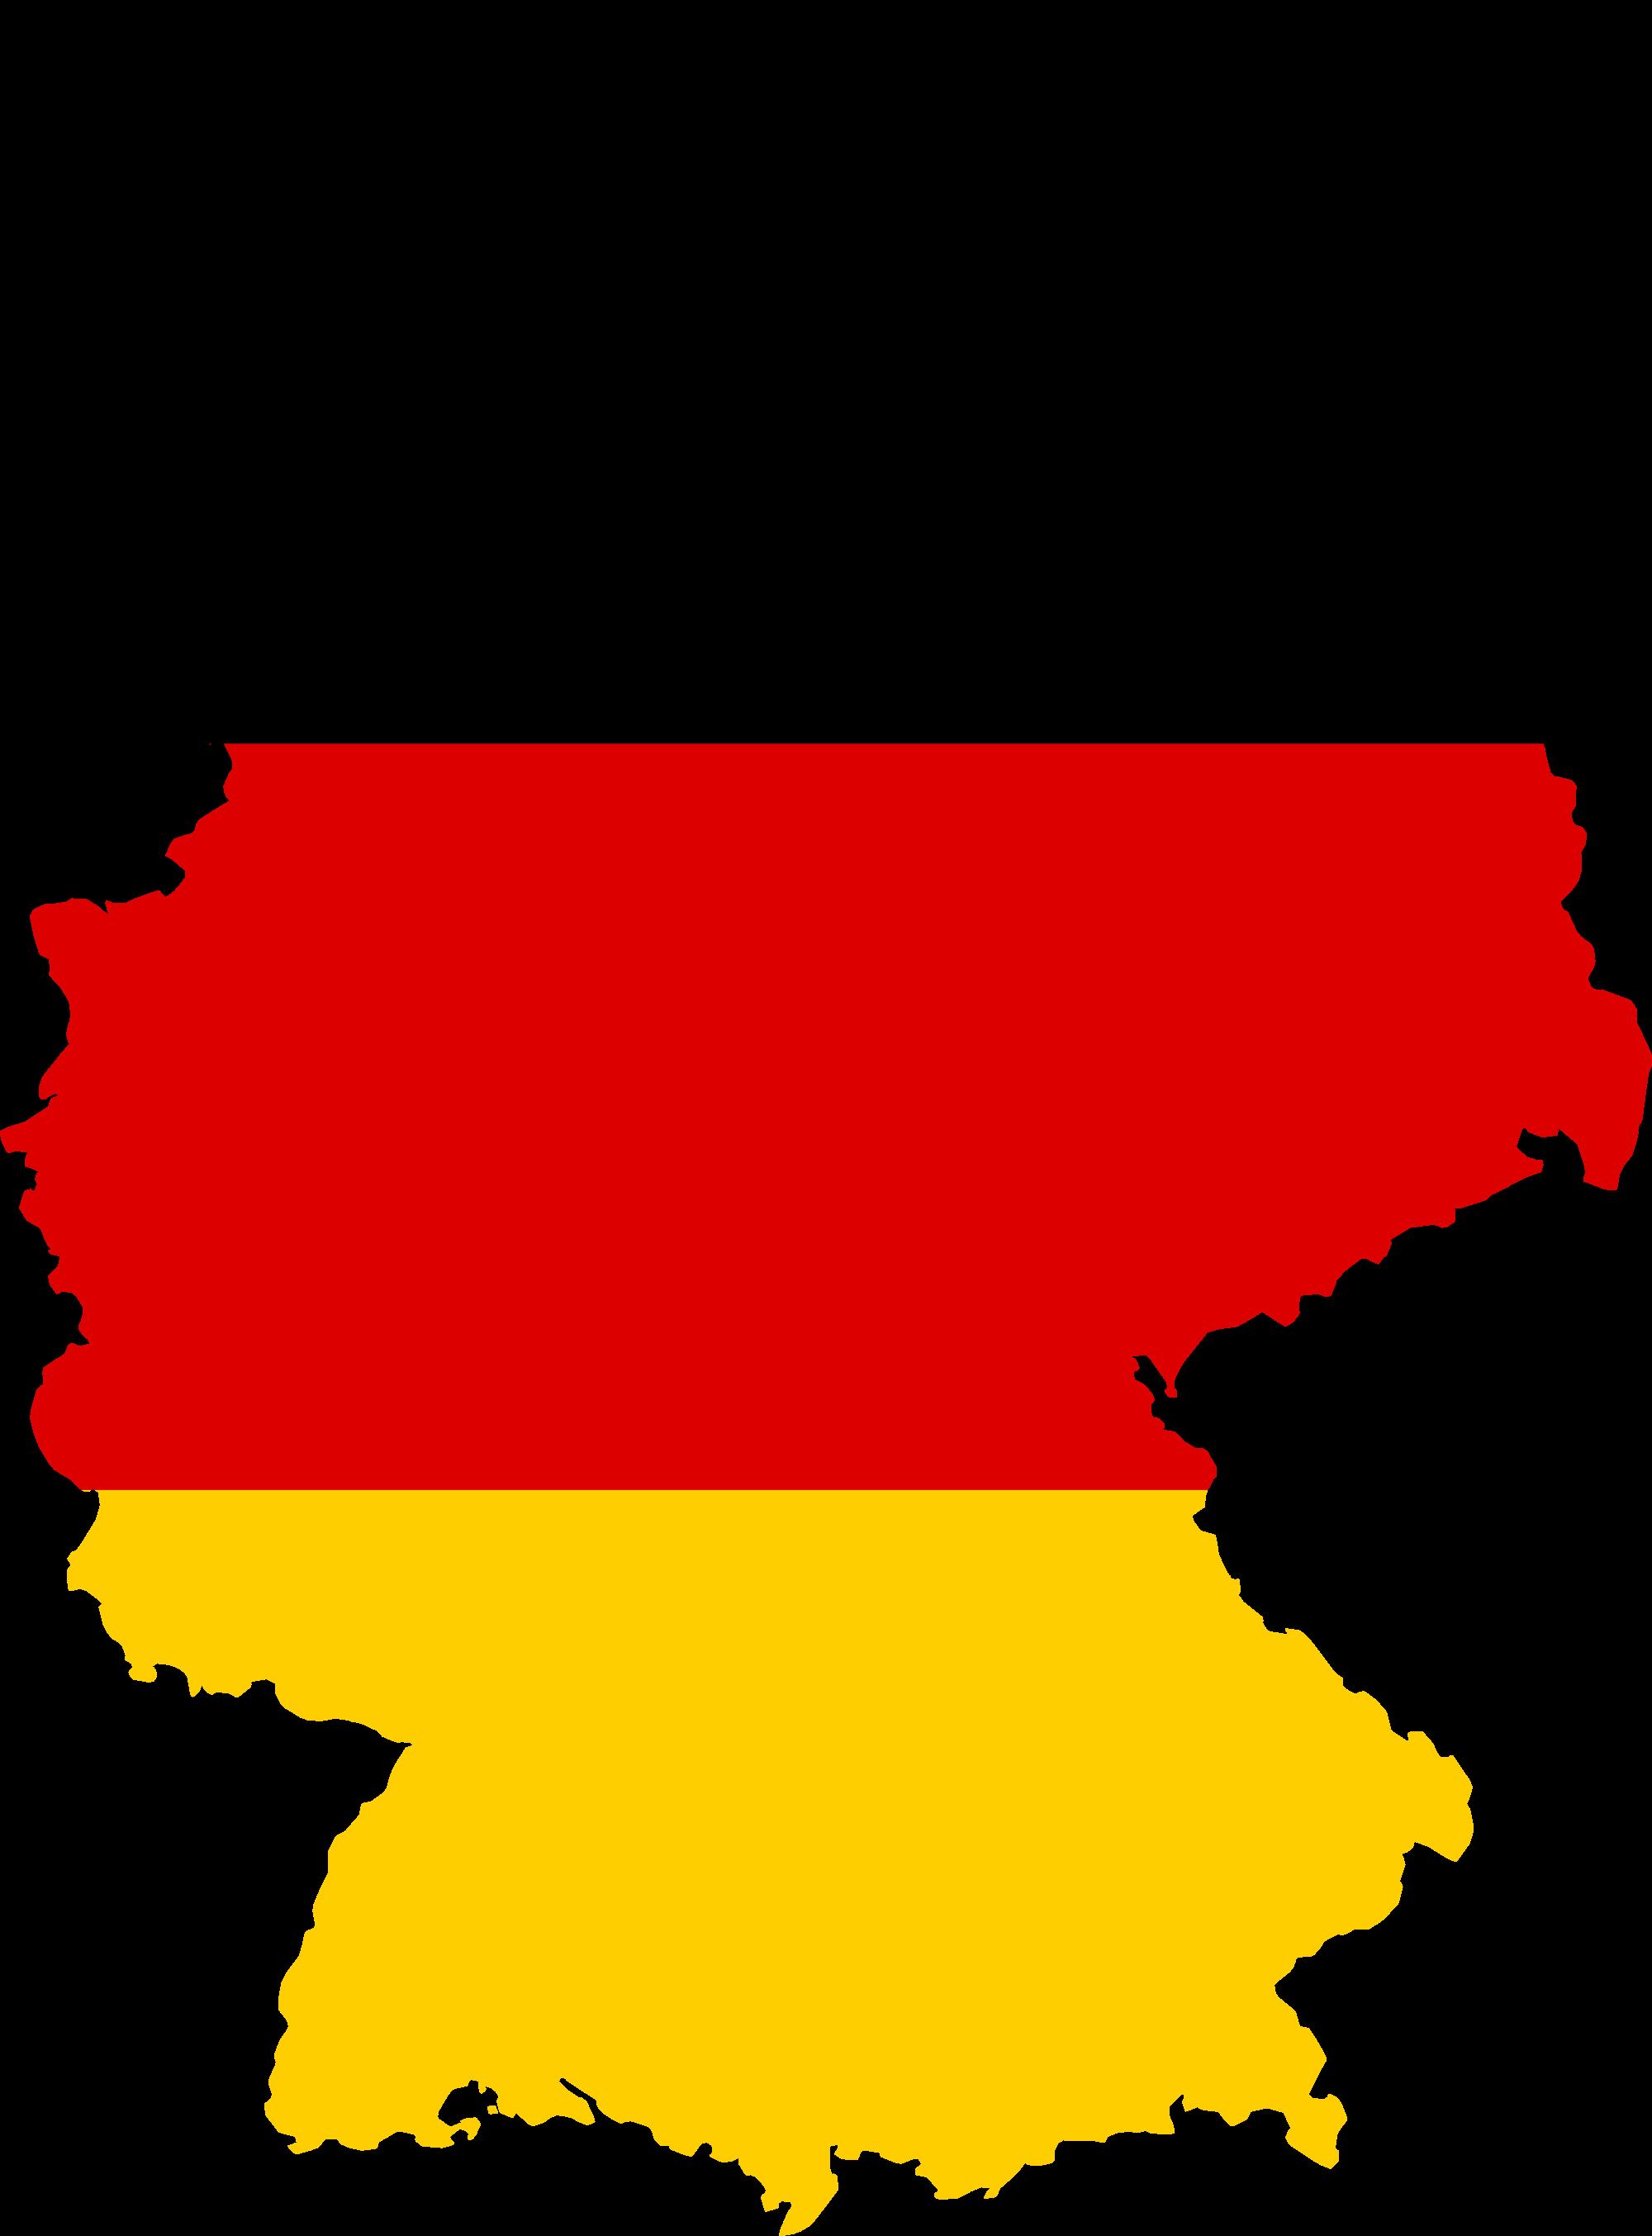 Waterfalls in Germany